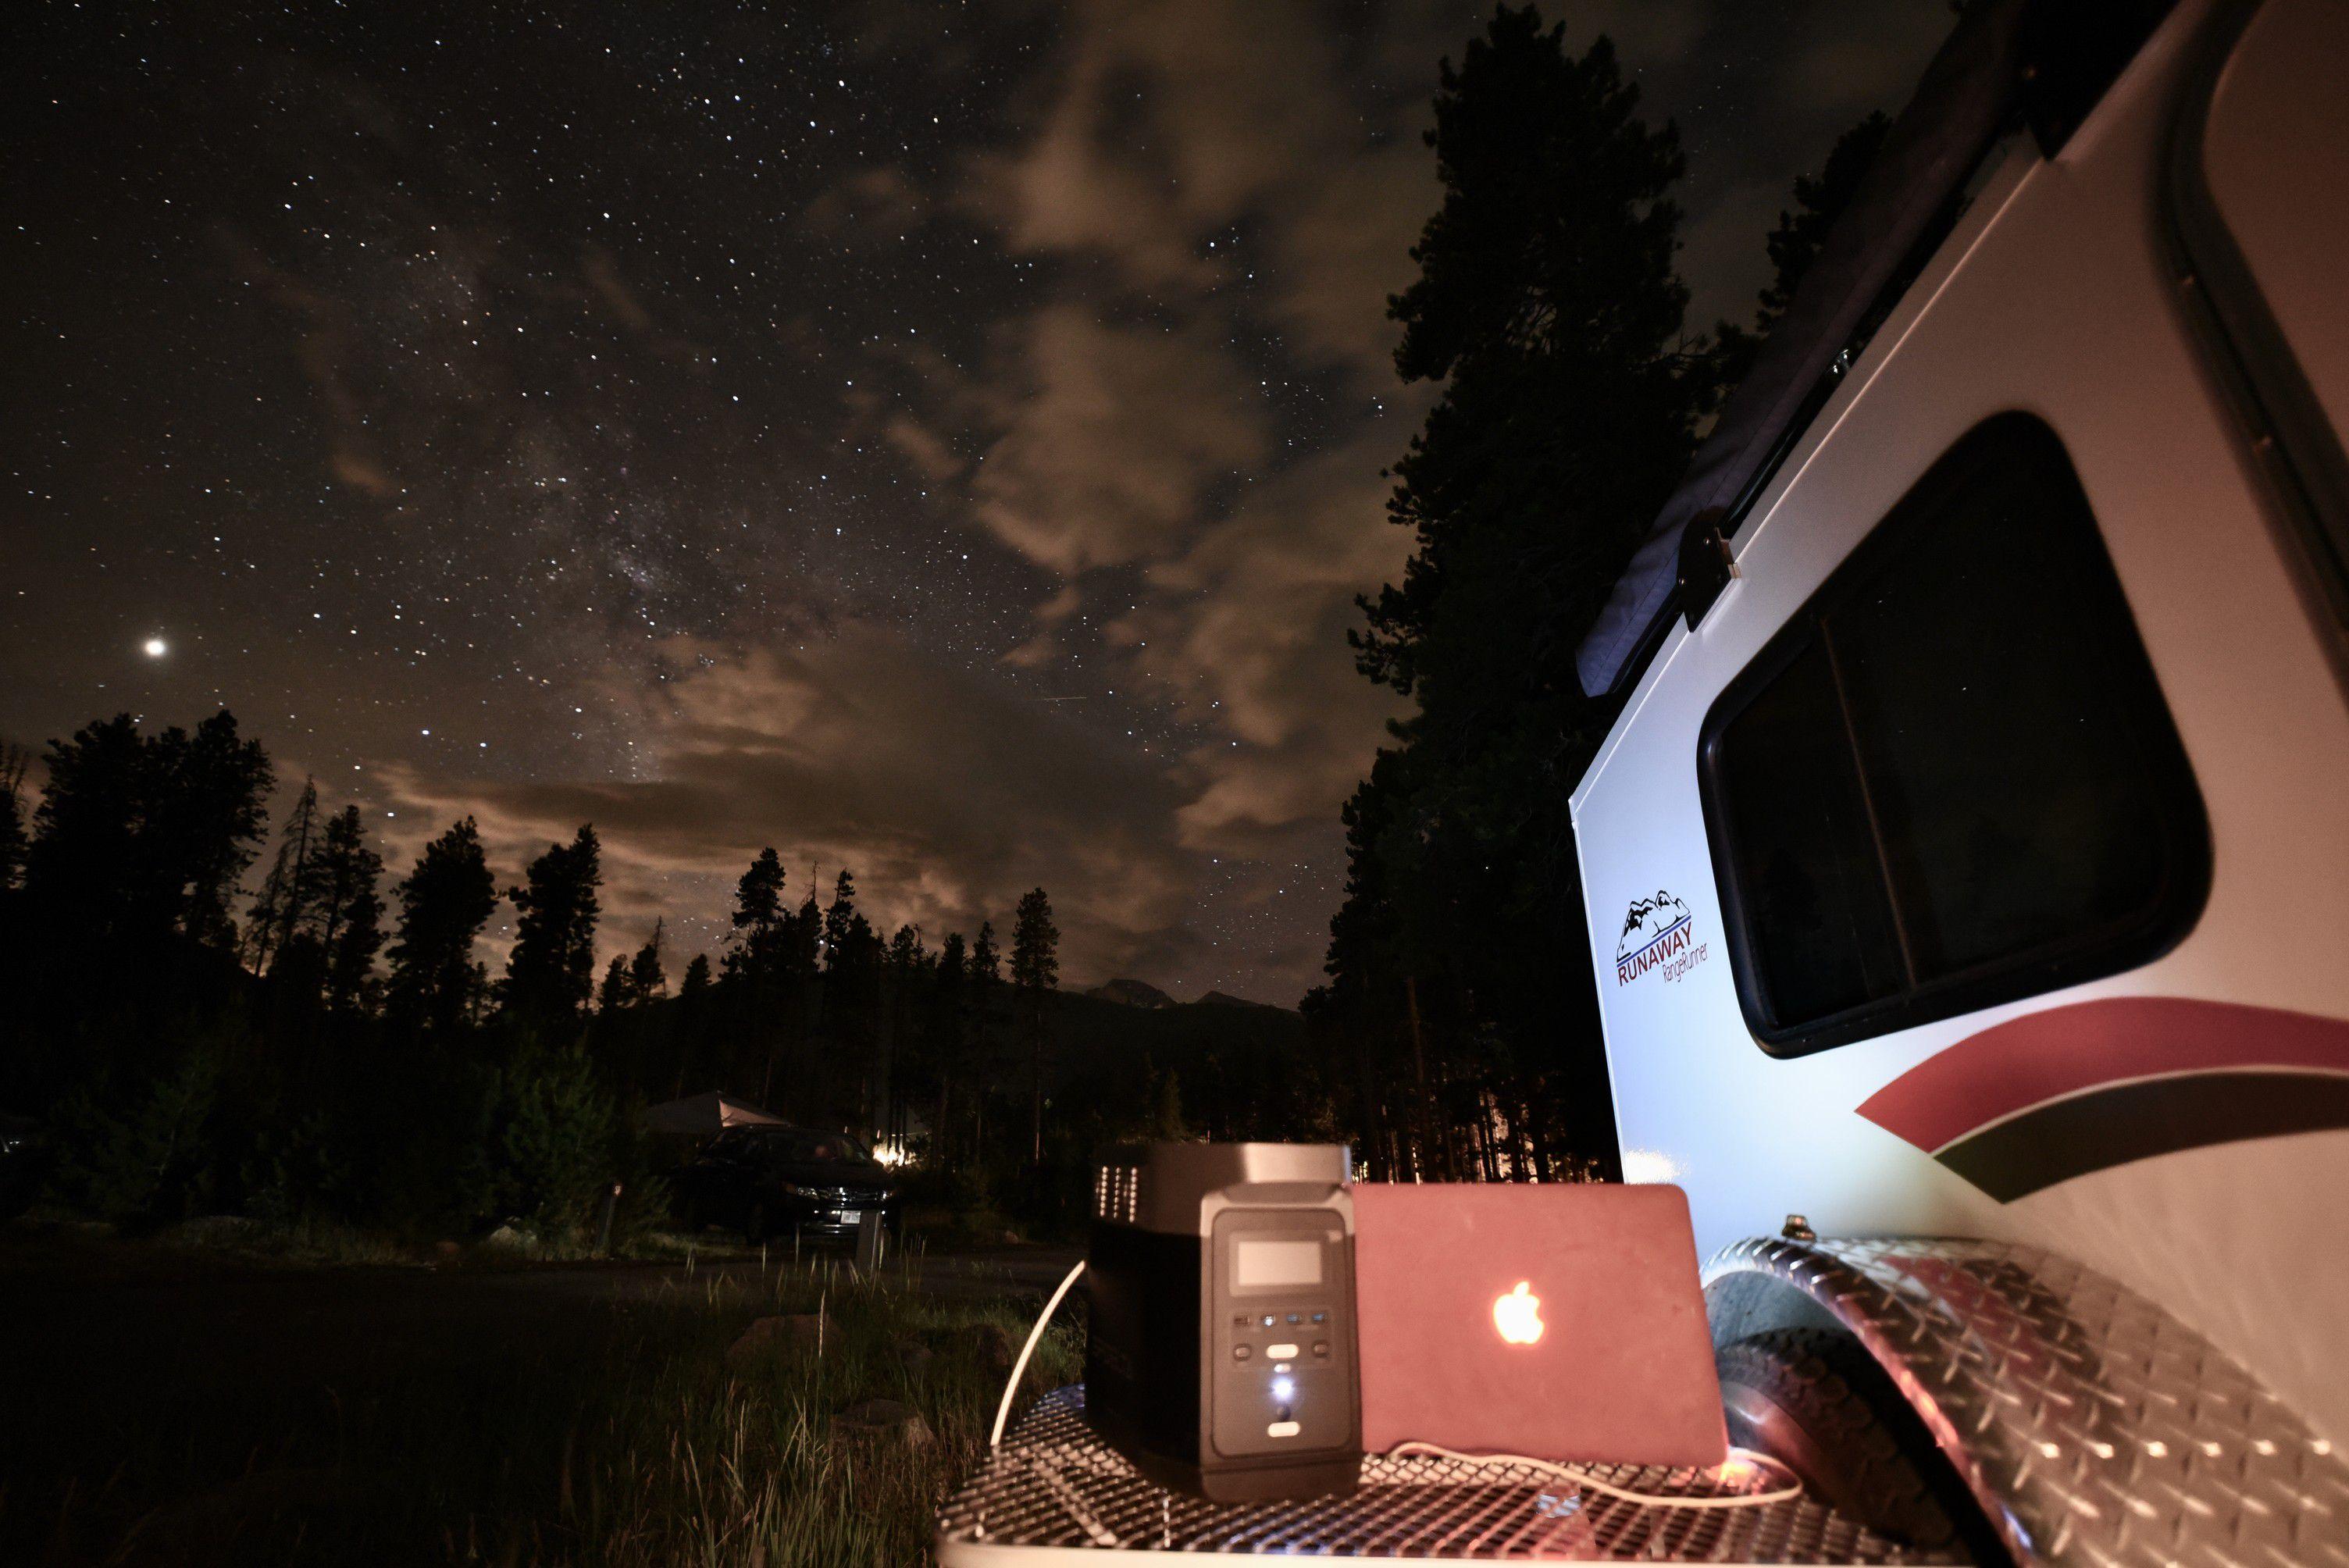 Batterie back up ecoflow 220V grande capacité 1800W camping van camping-car